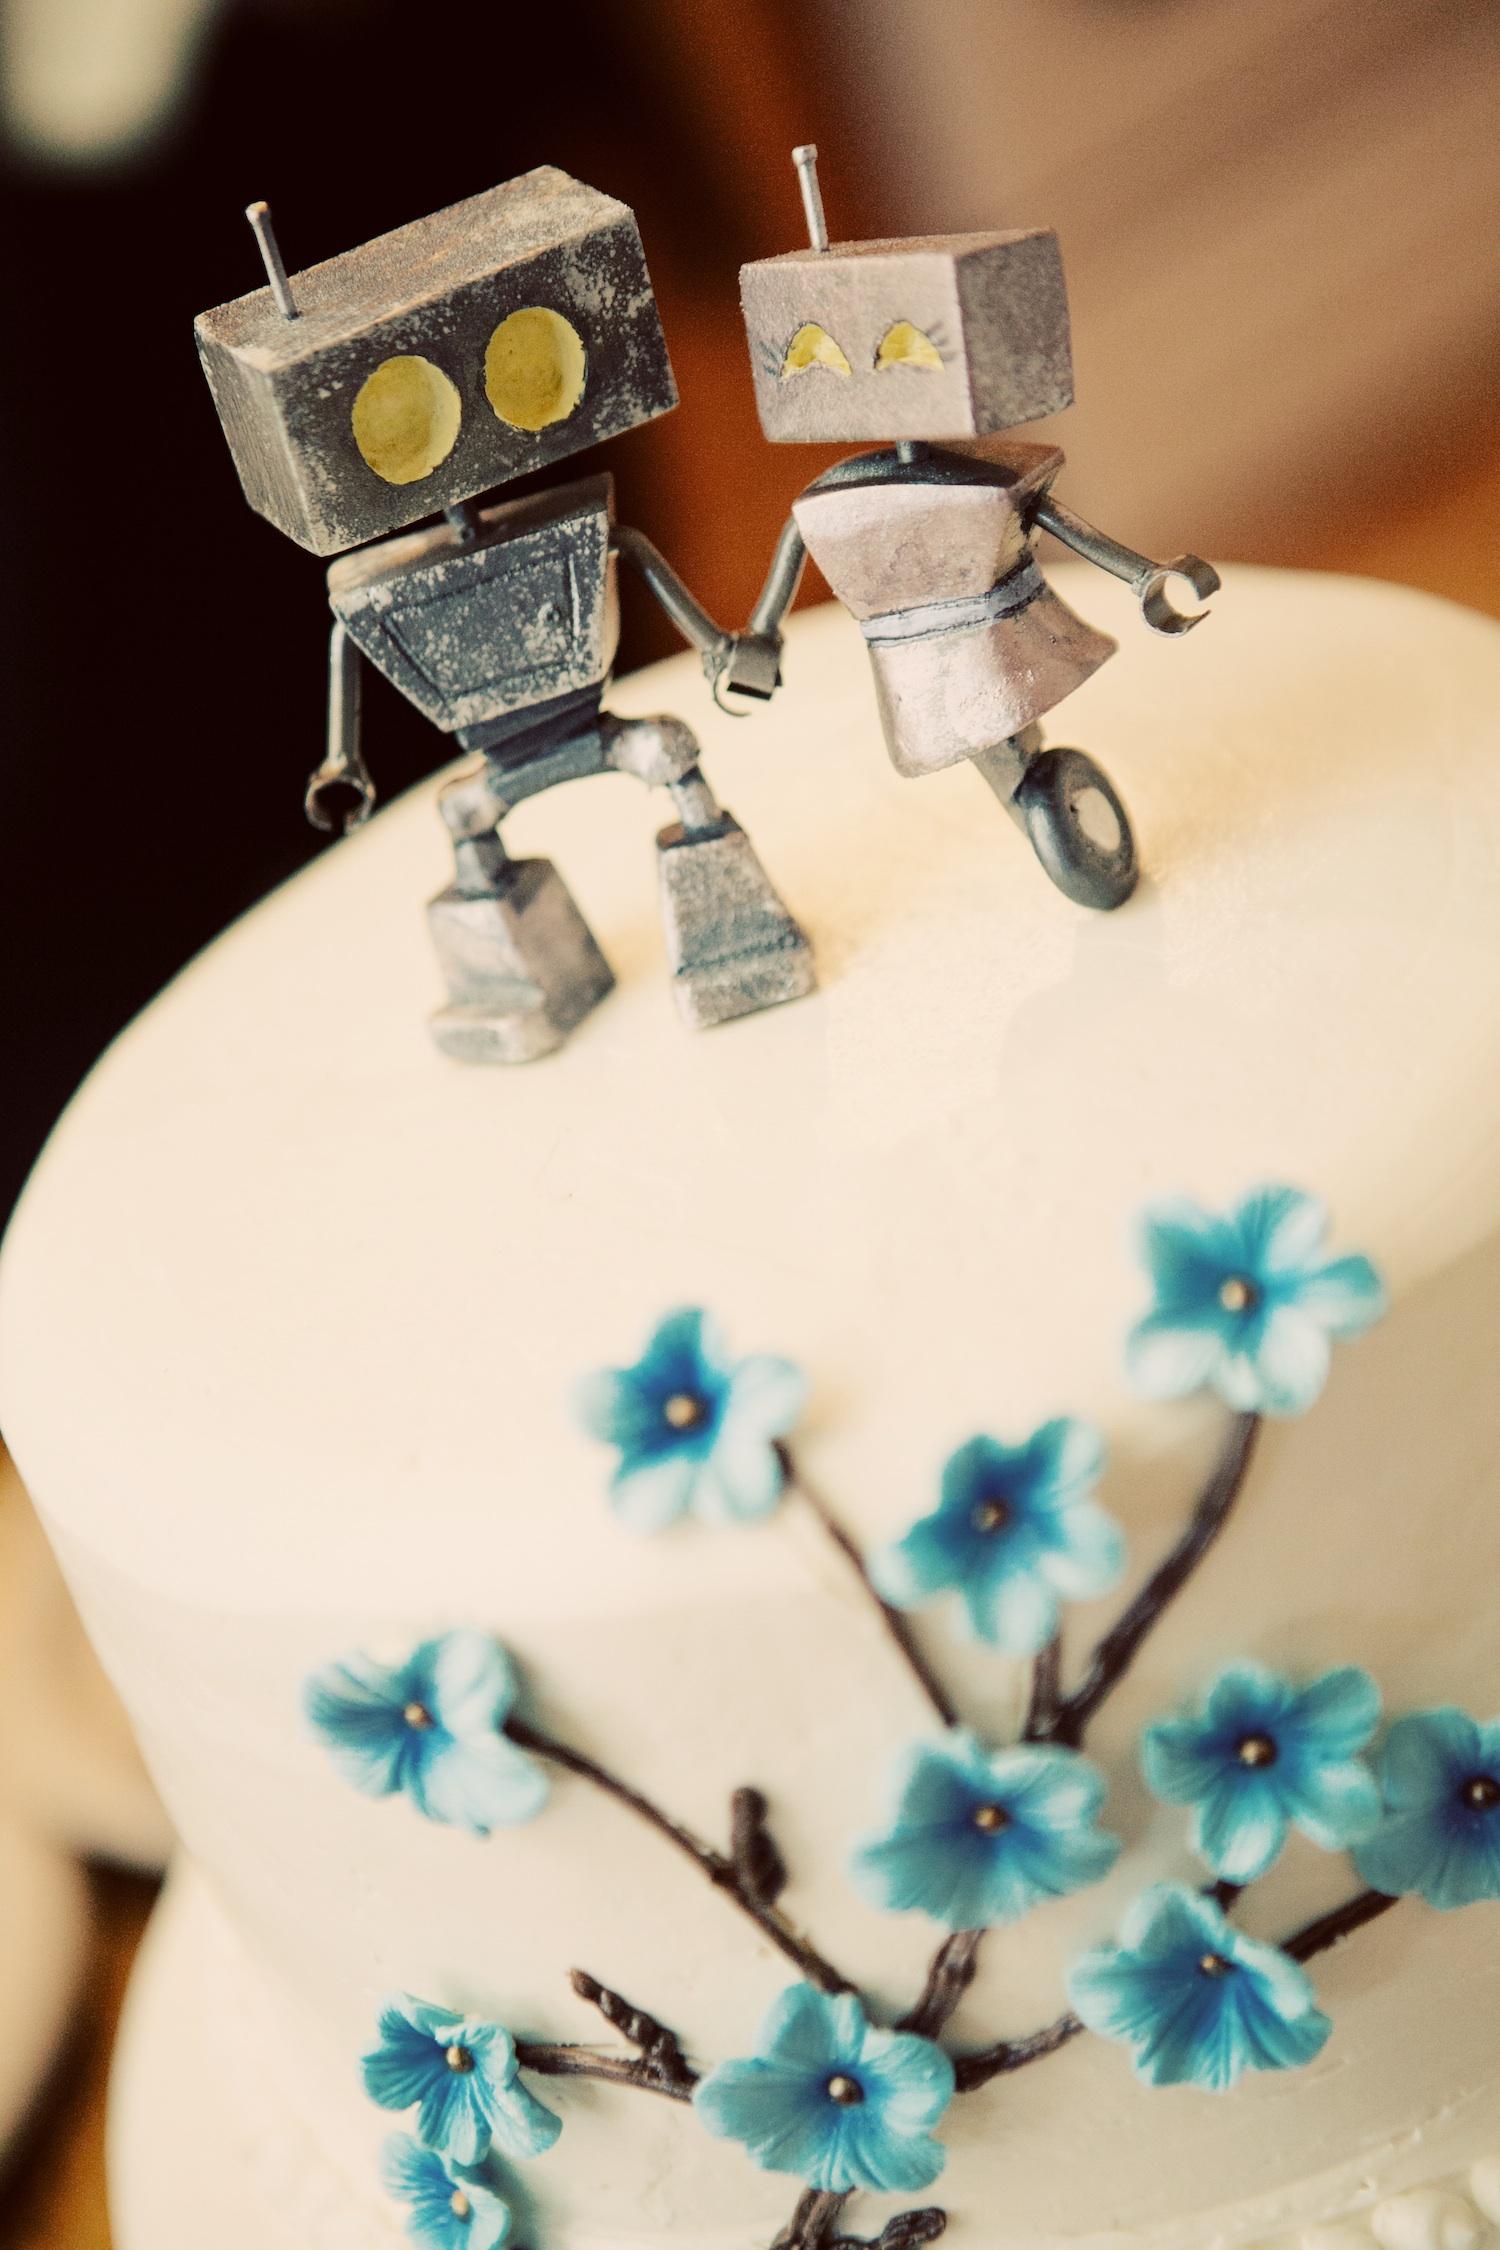 DIY robot wedding cake toppers